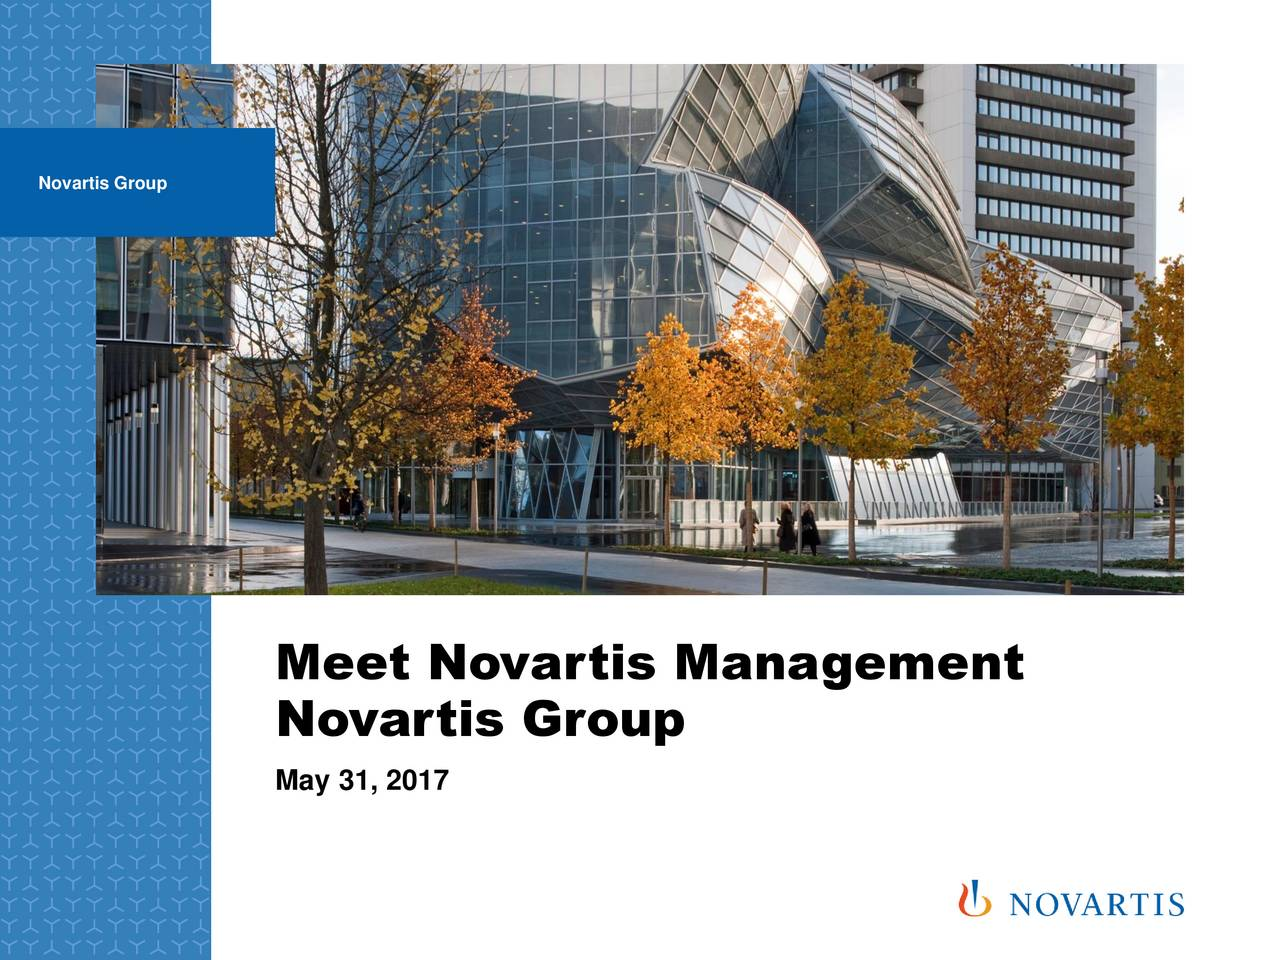 Meet Novartis Management Novartis Group May 31, 2017